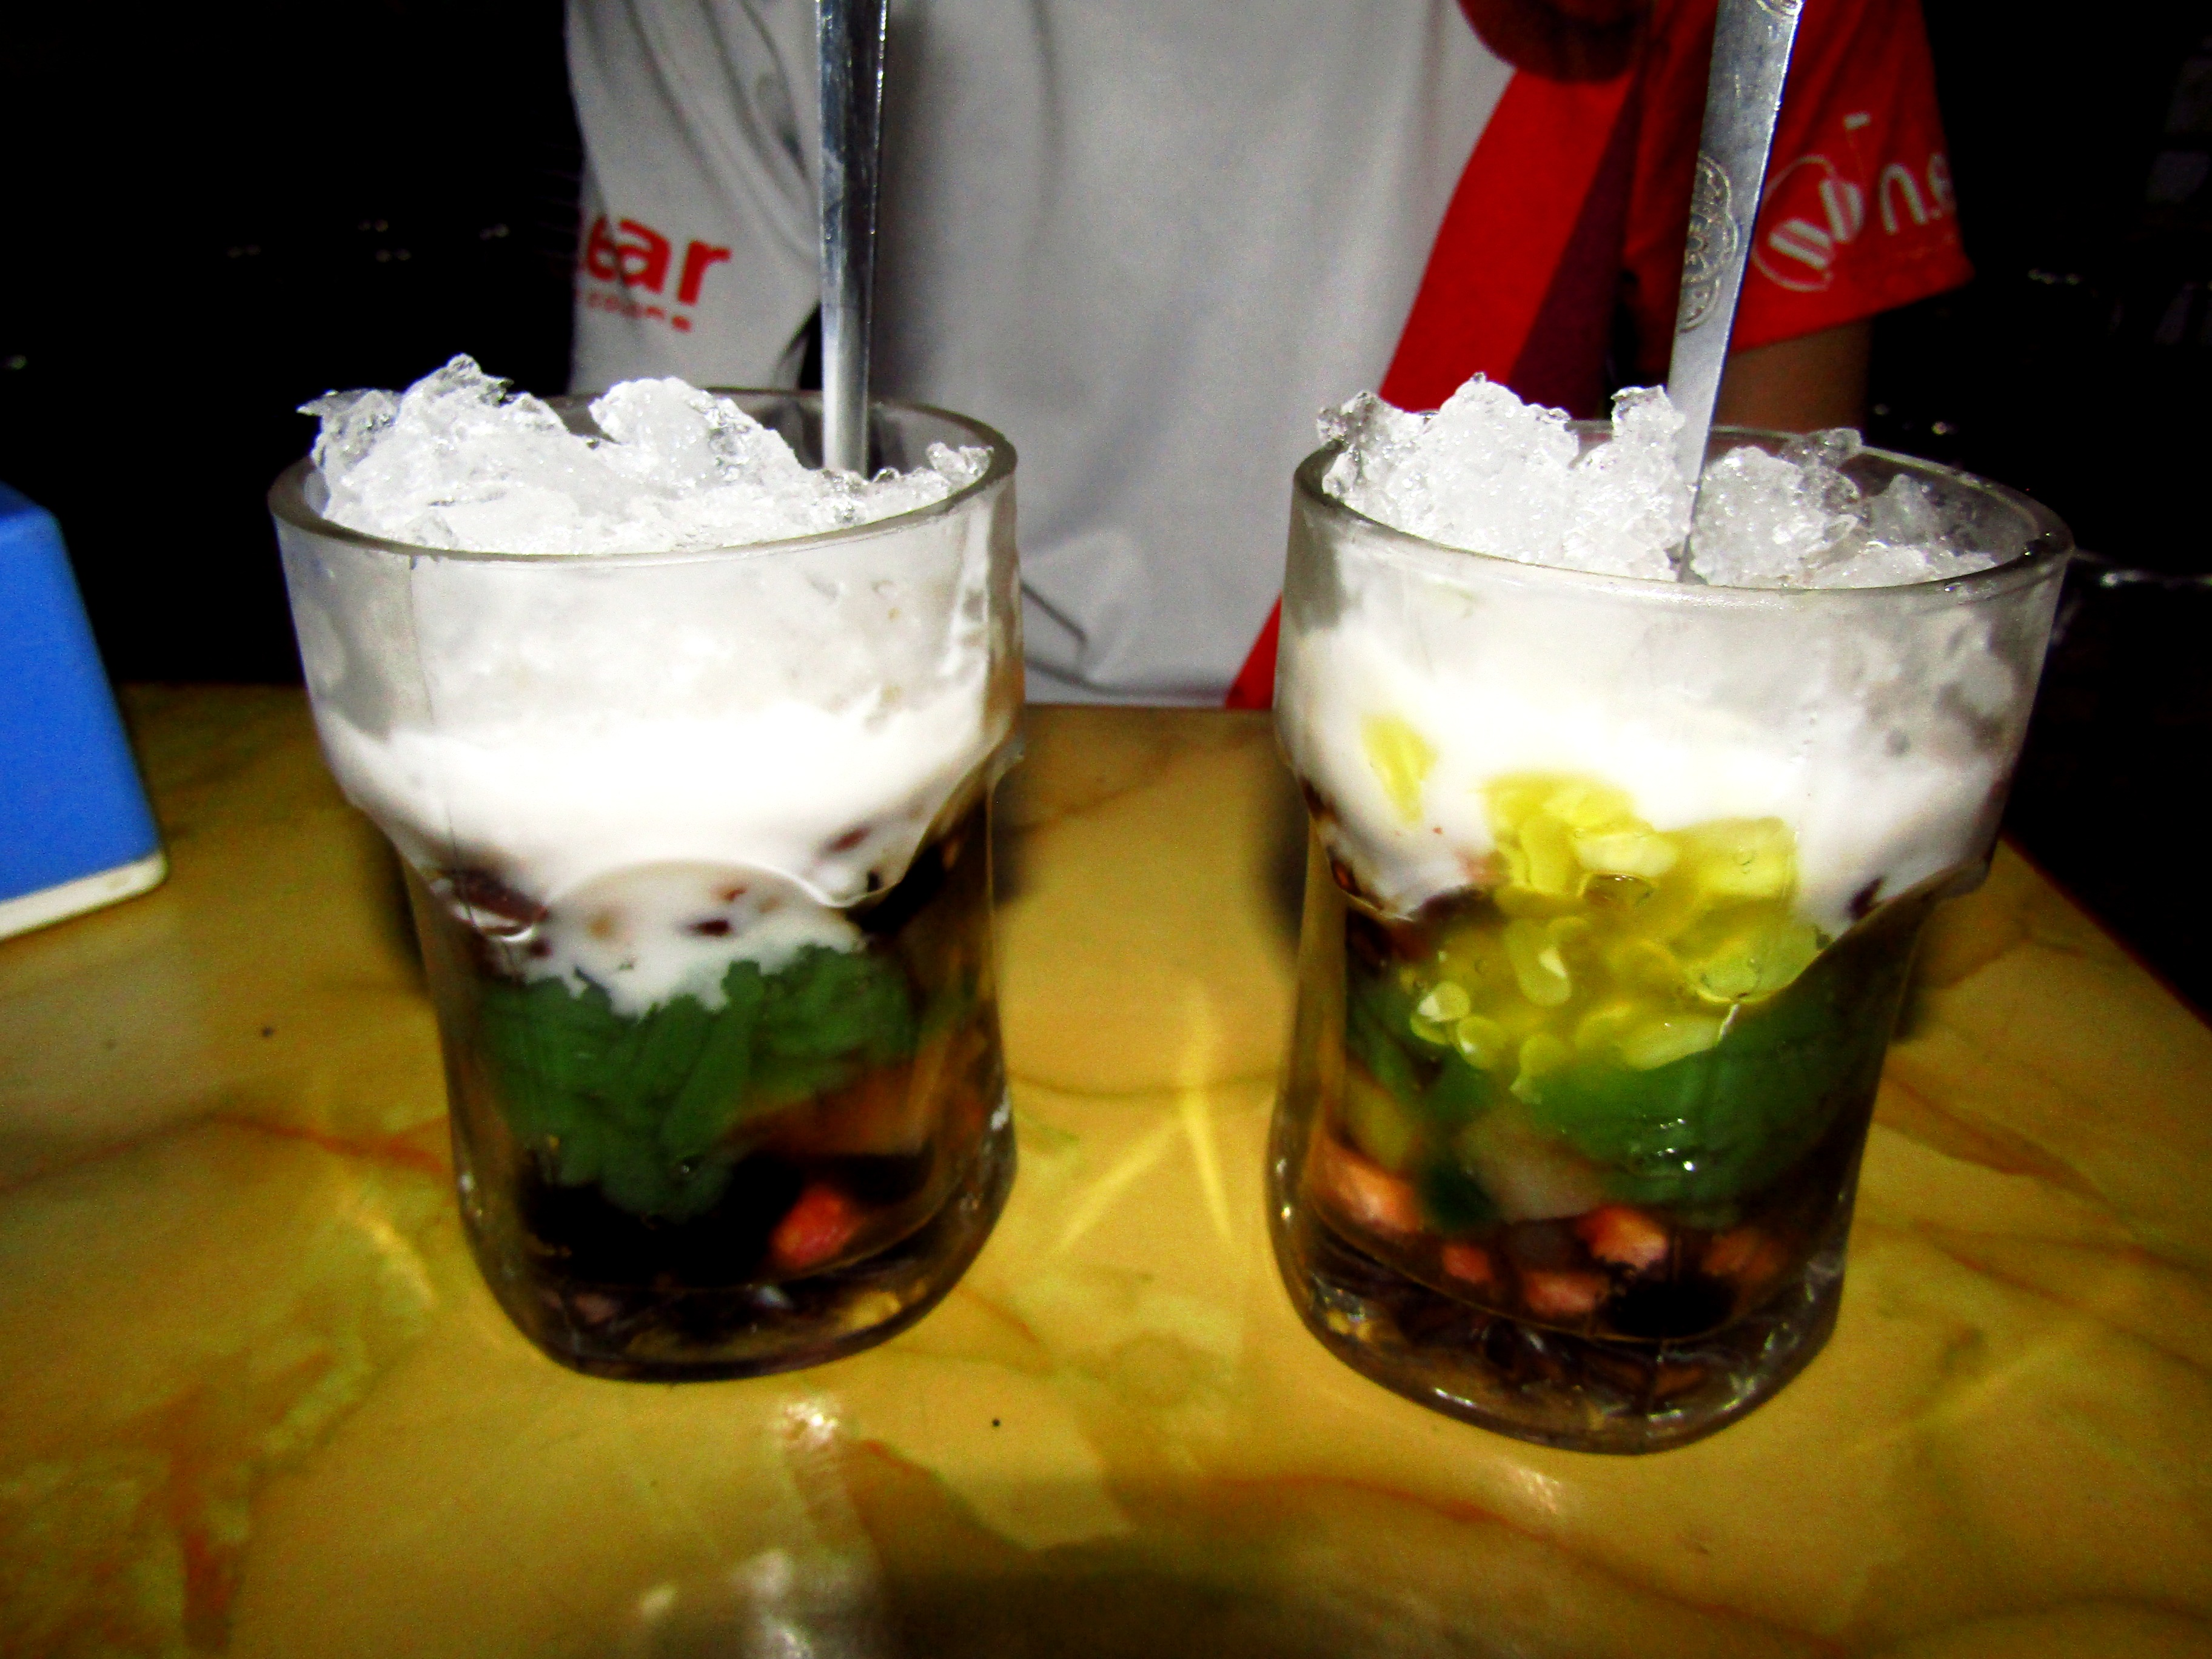 Chè - the traditional sweet Vietnamese dessert